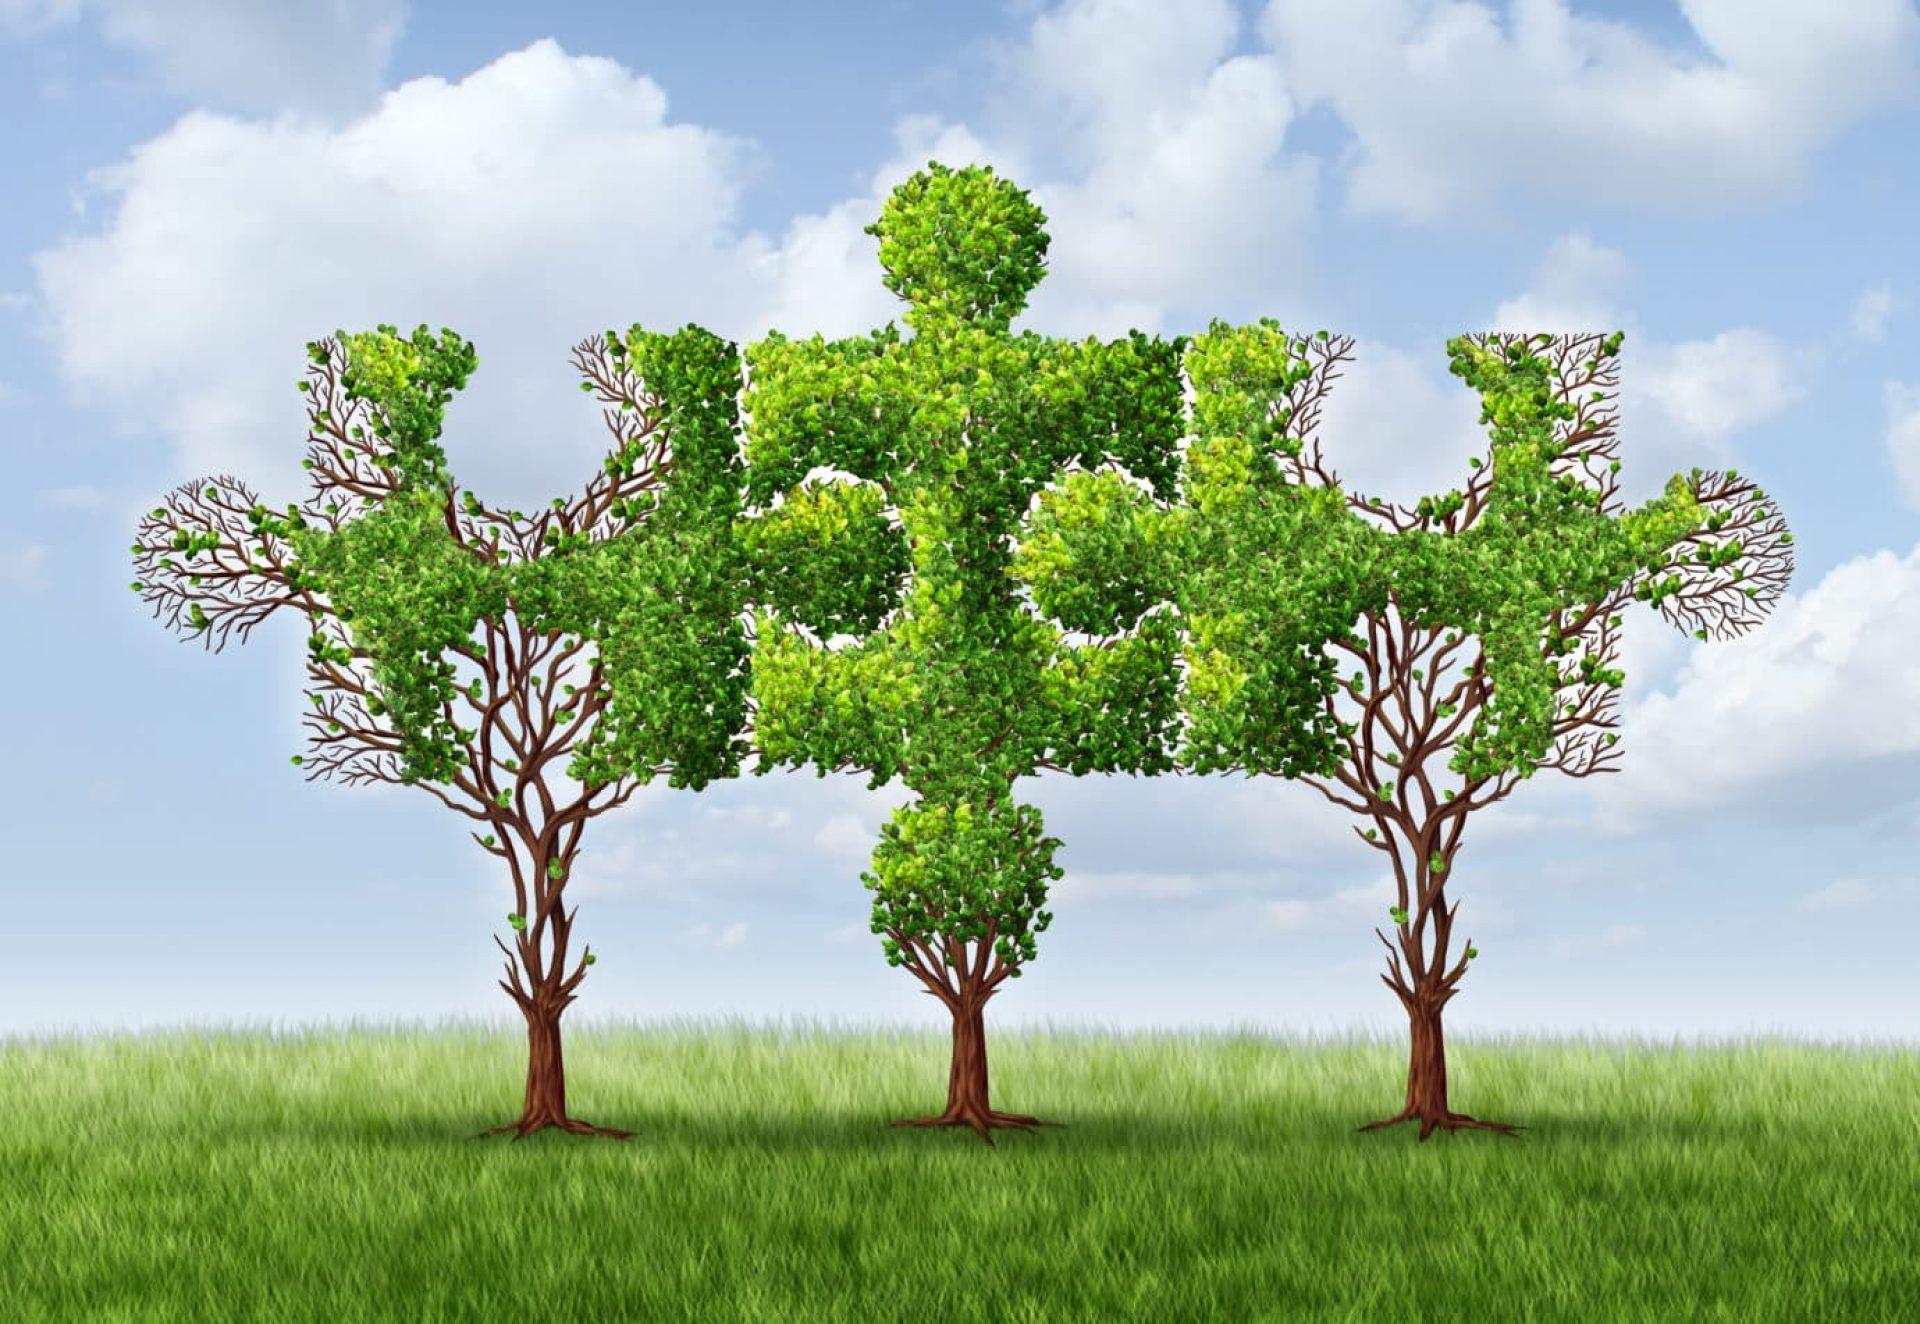 Cooperation trees